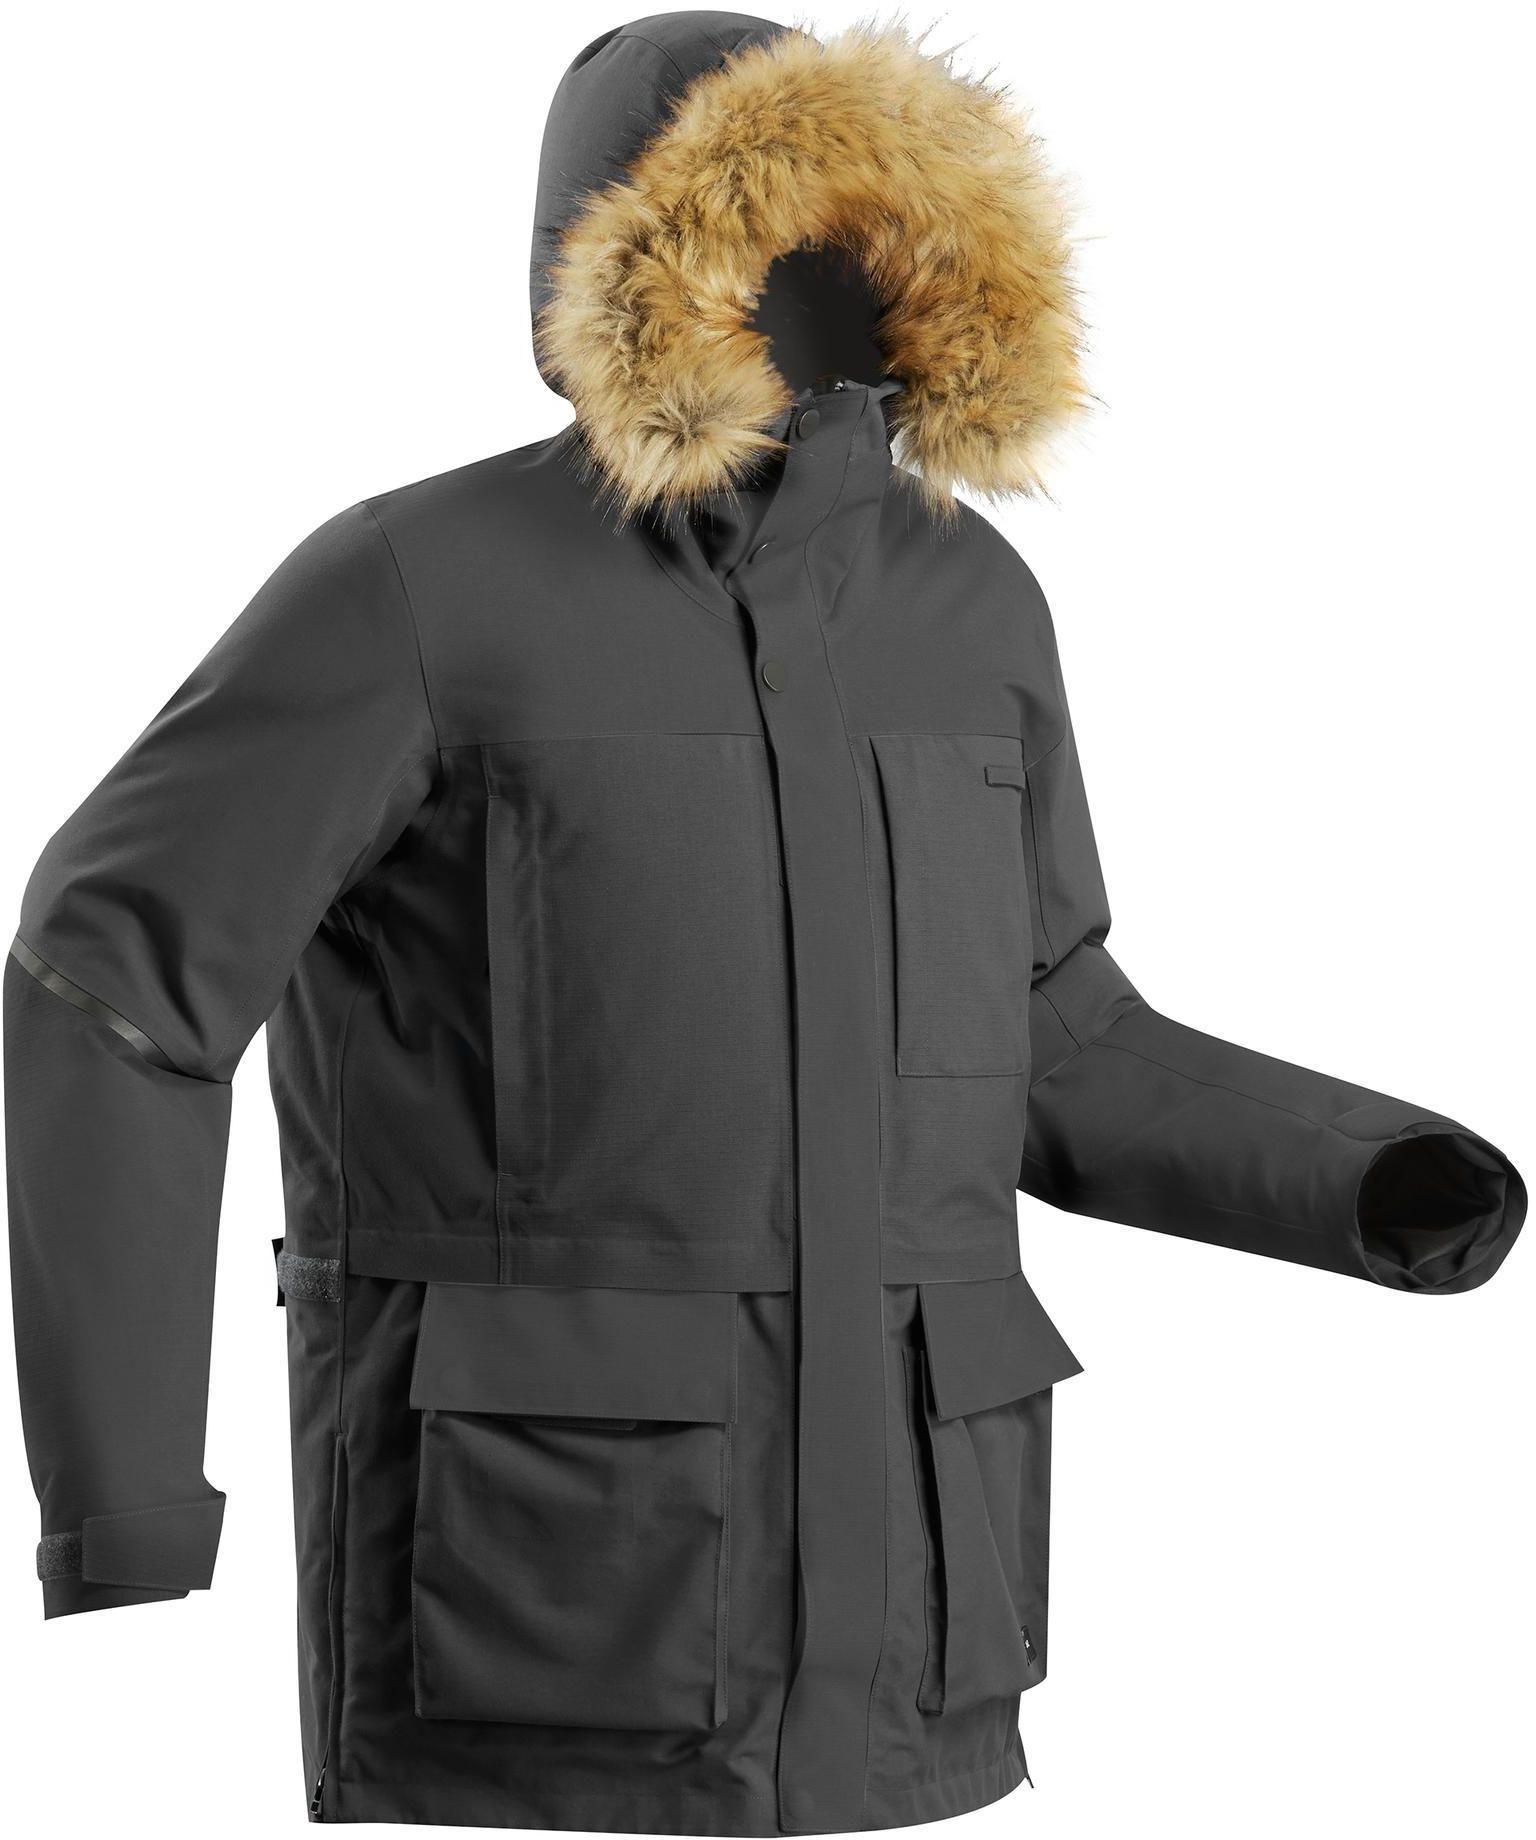 Kurtka Parka trekkingowa Arctic 500 Extra Warm unisex